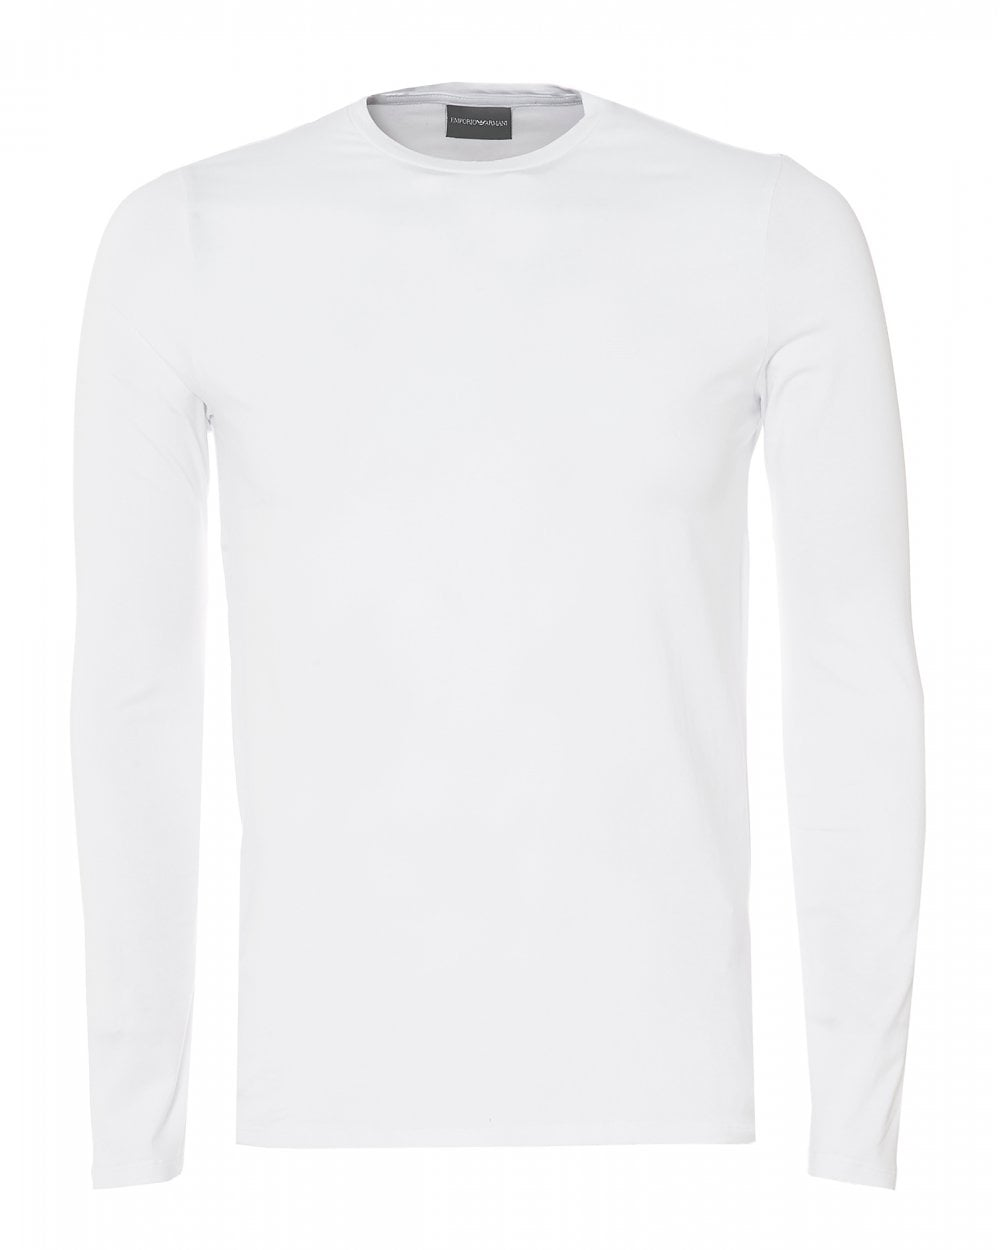 21a08722 Emporio Armani Mens Basic Long Sleeve T-Shirt, White Regular Fit Tee